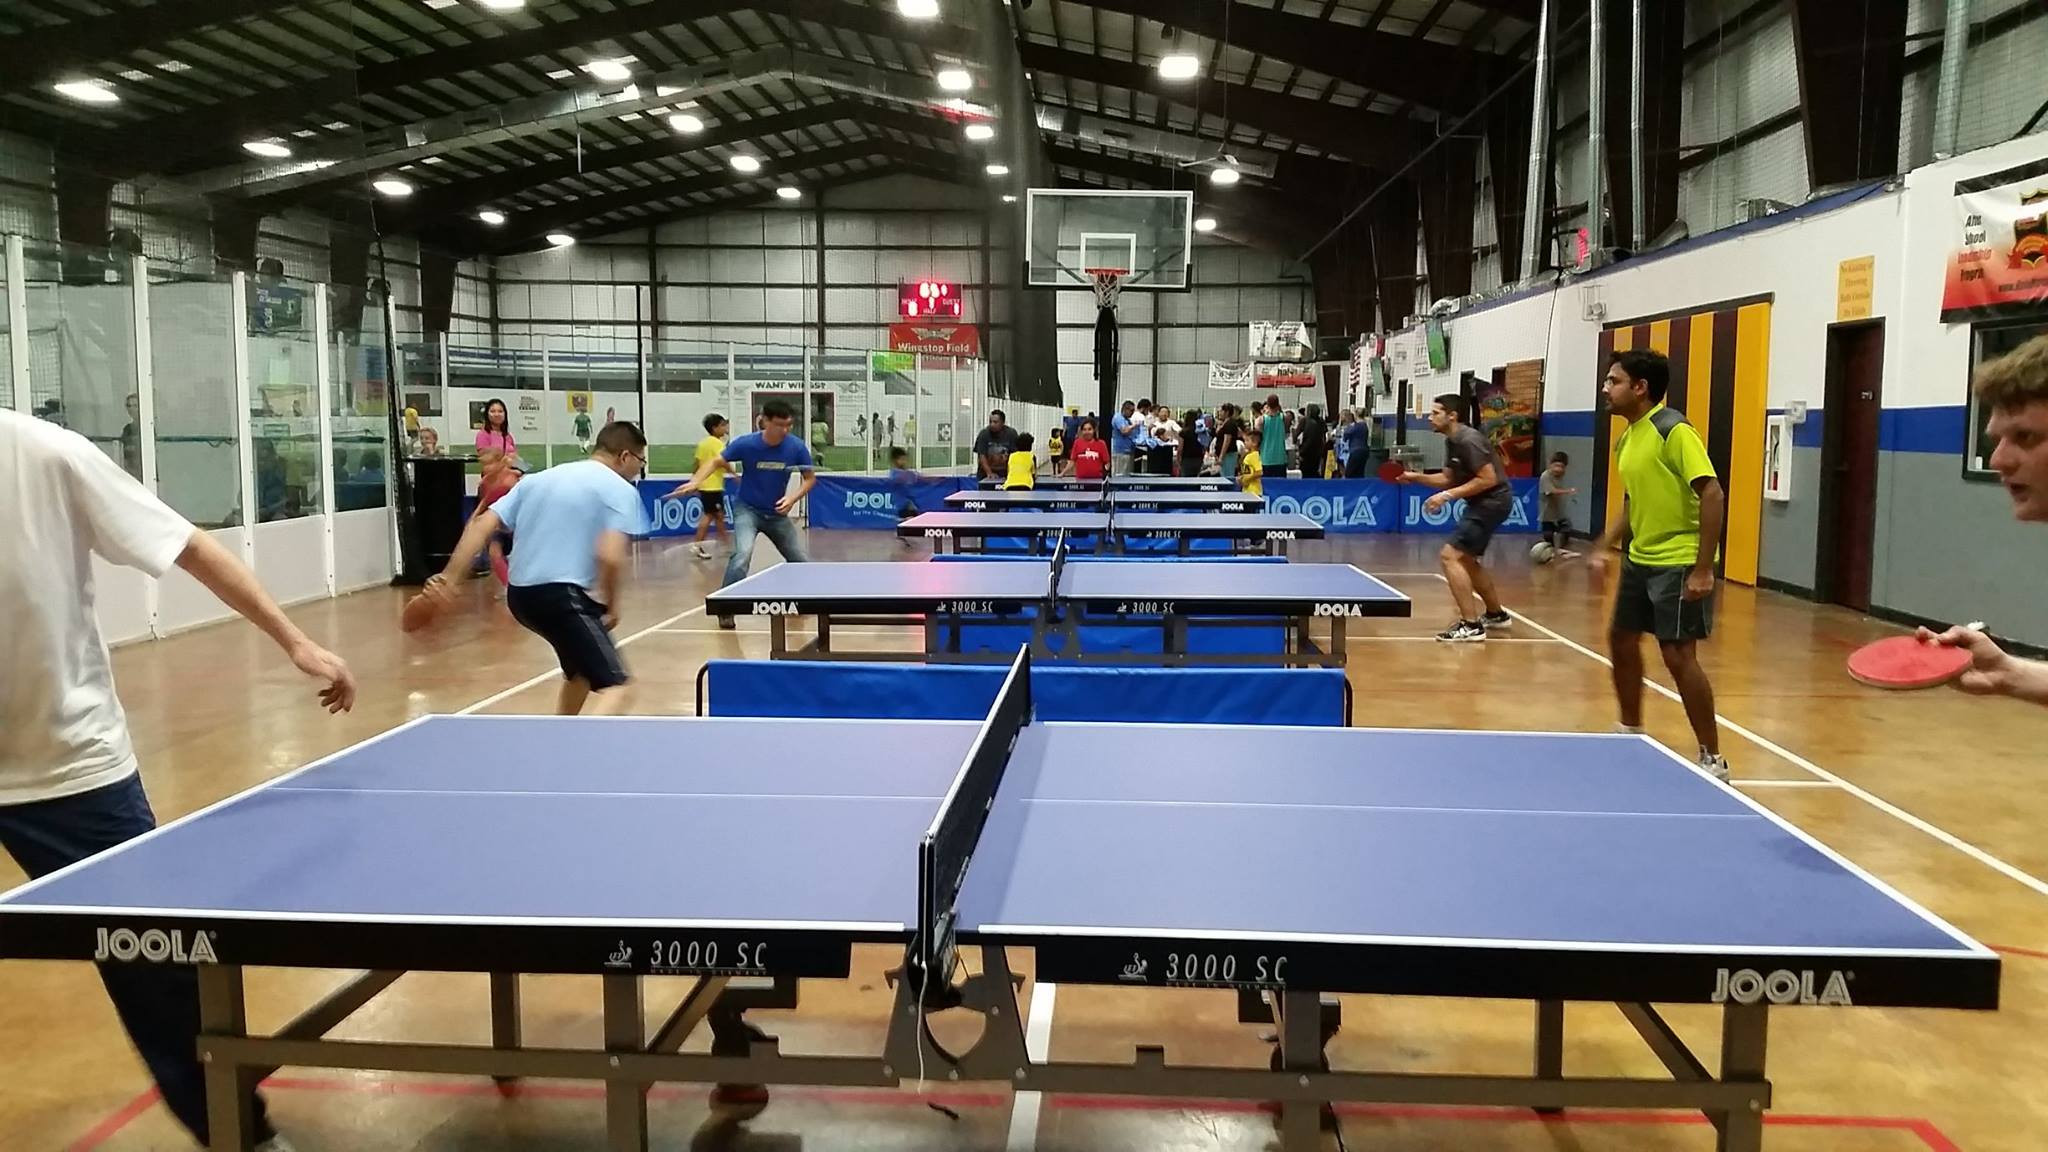 Pong Club South Austin